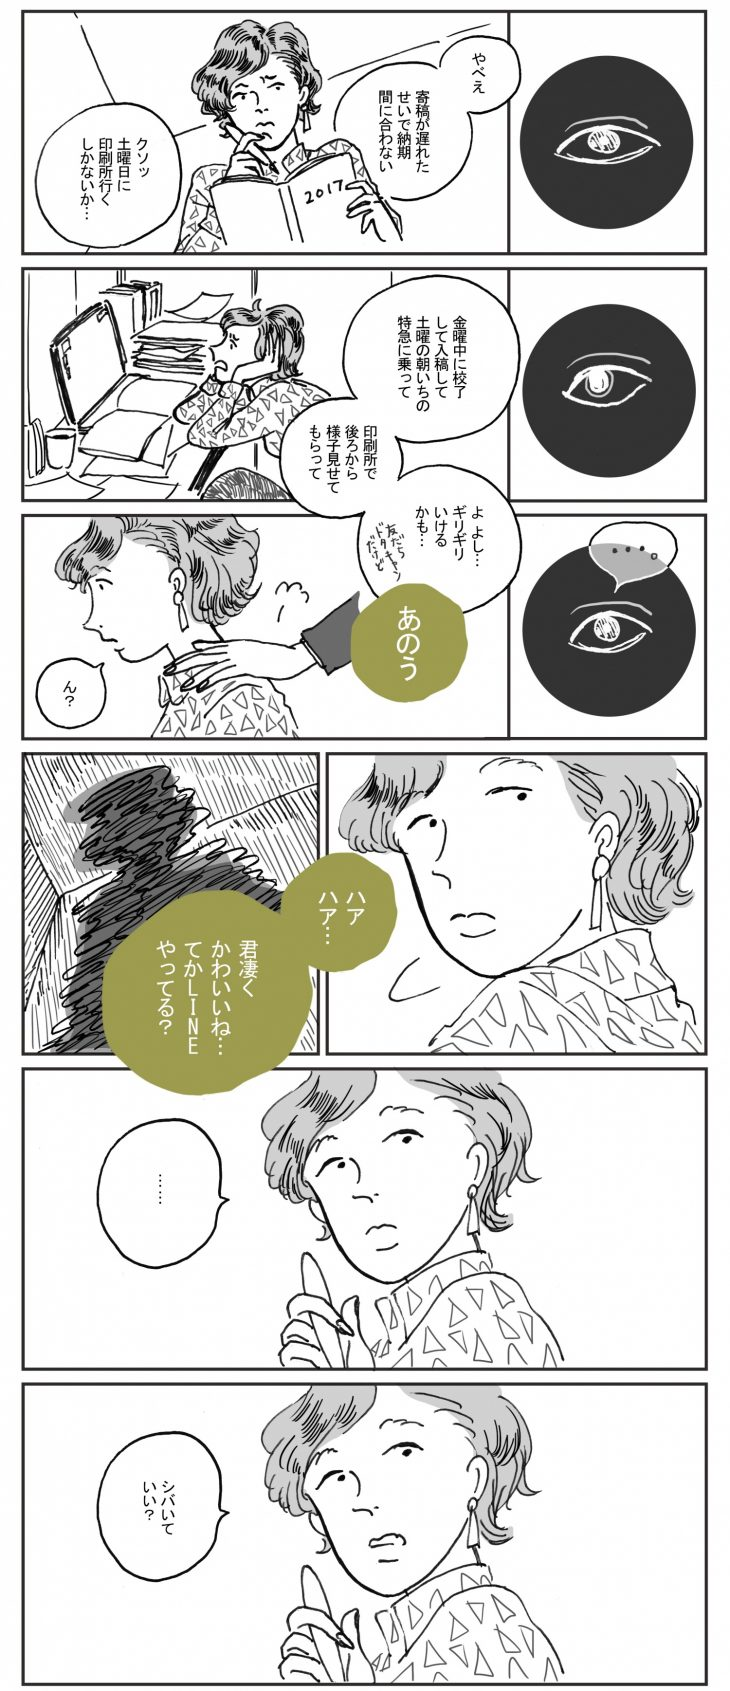 yabai_201705_1manga